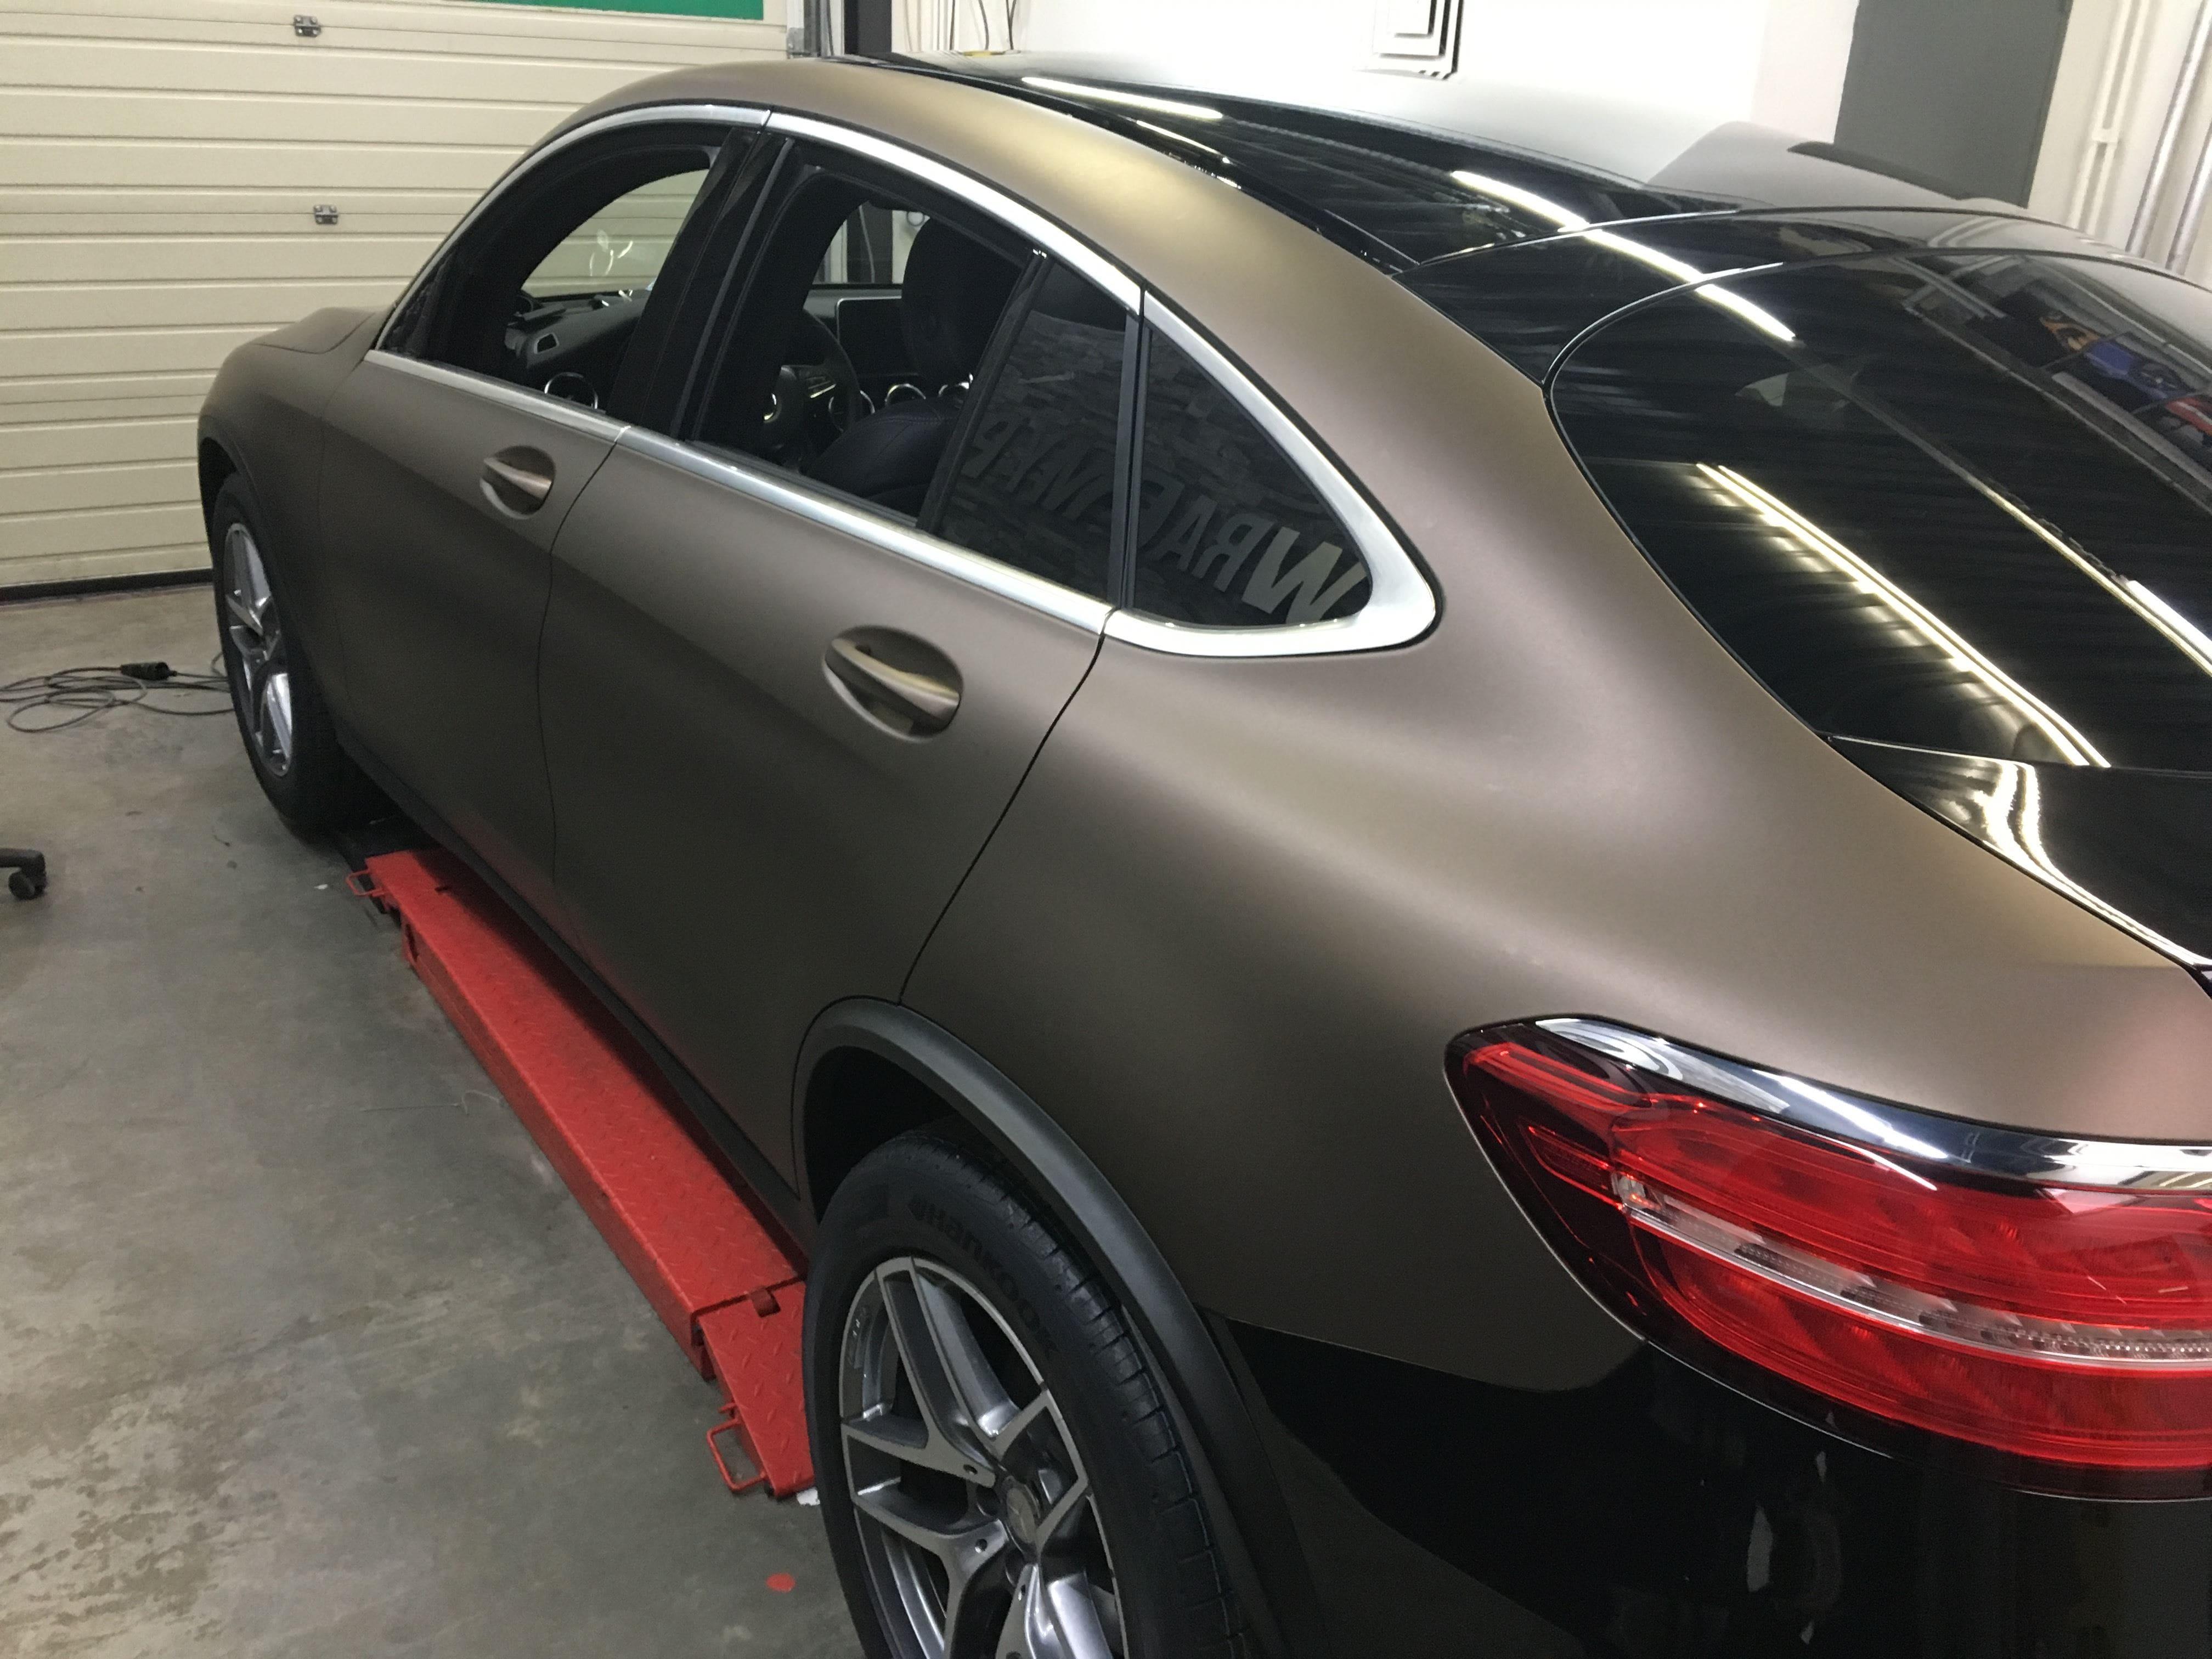 Mercedes GLC Coupe Matte metallic brown, Carwrapping door Wrapmyride.nu Foto-nr:9381, ©2021